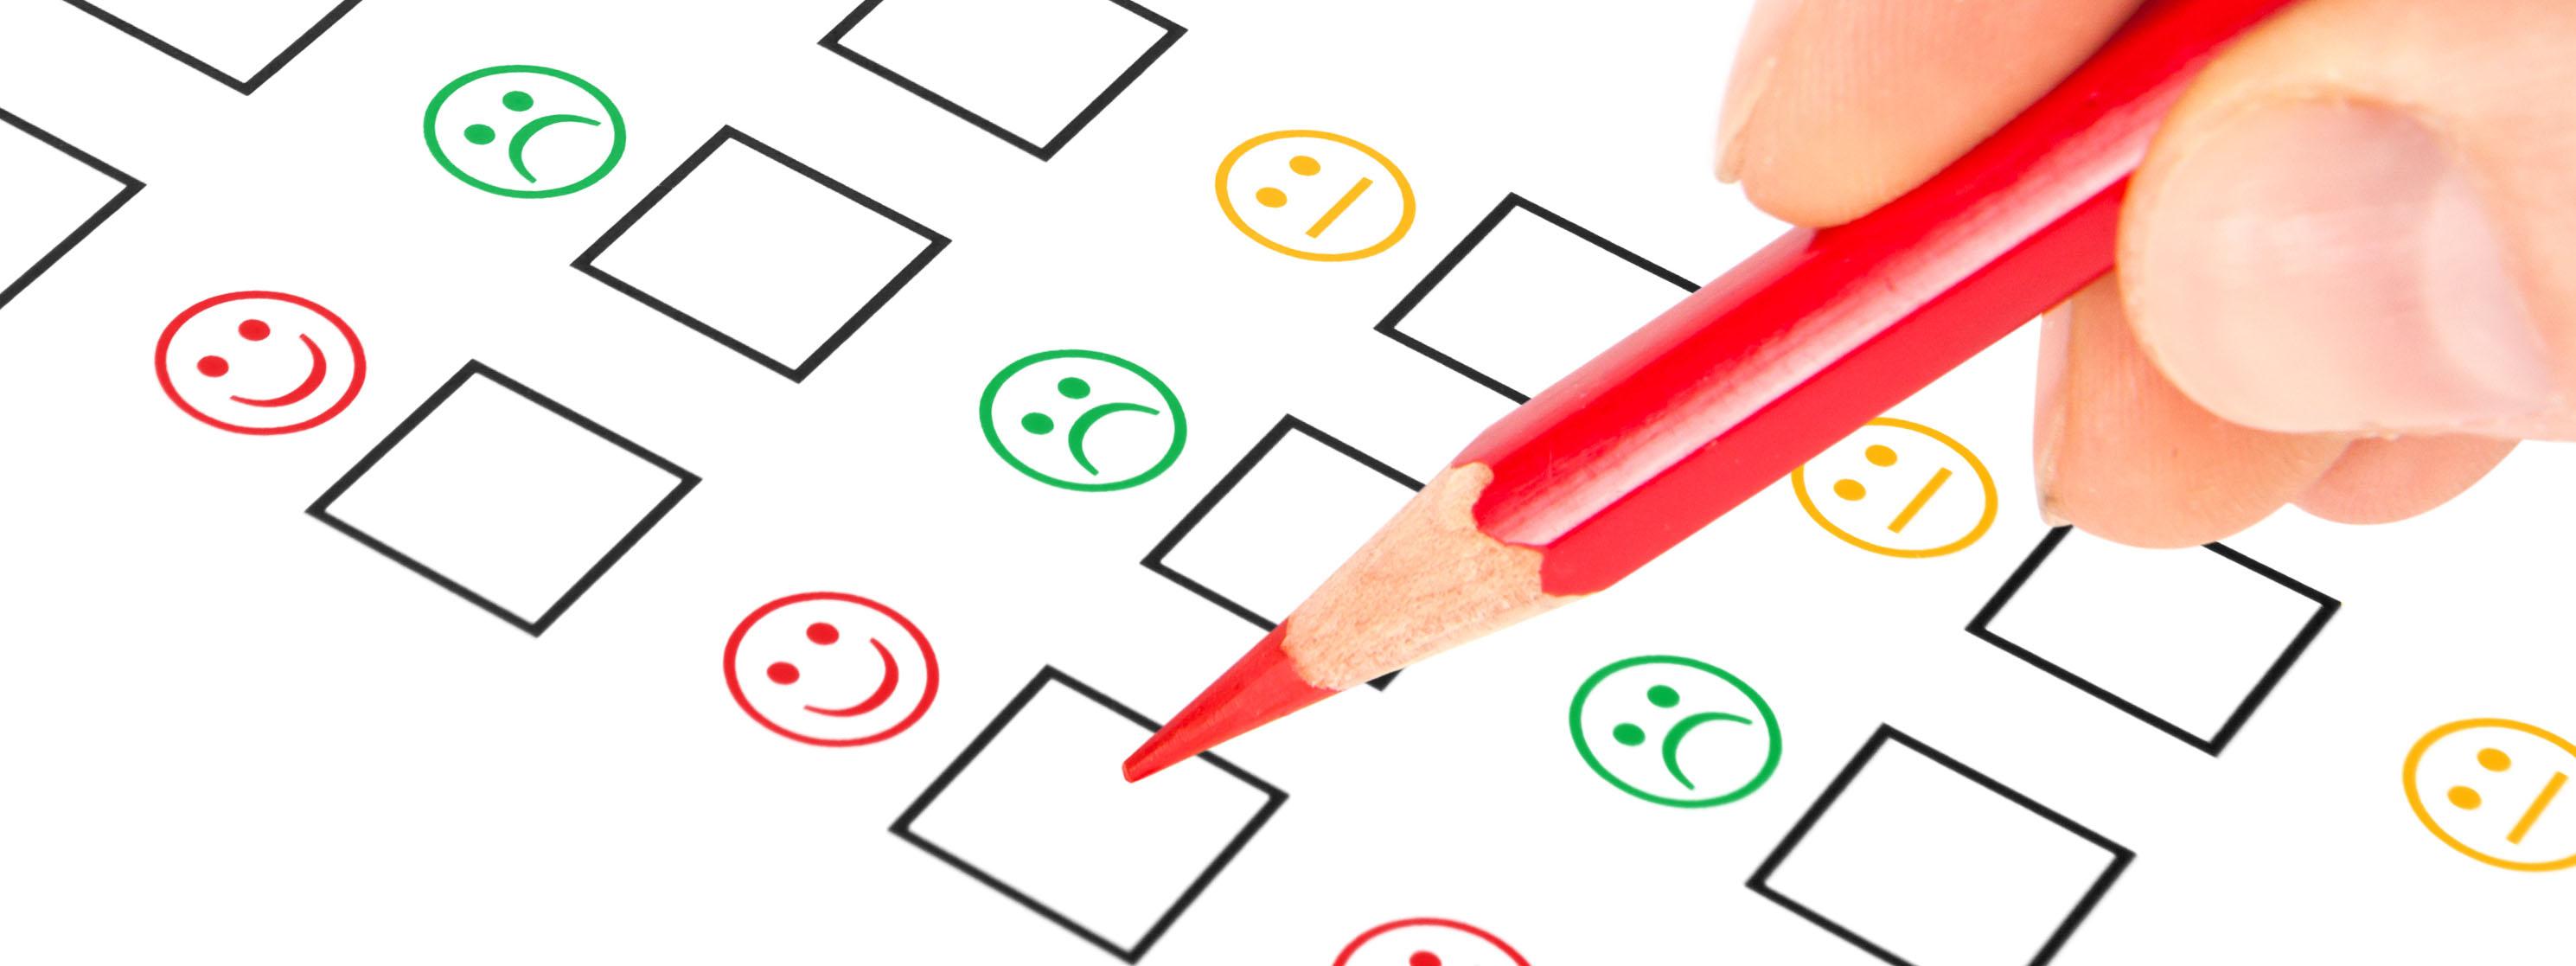 Satisfy Your Customers, Not Metrics